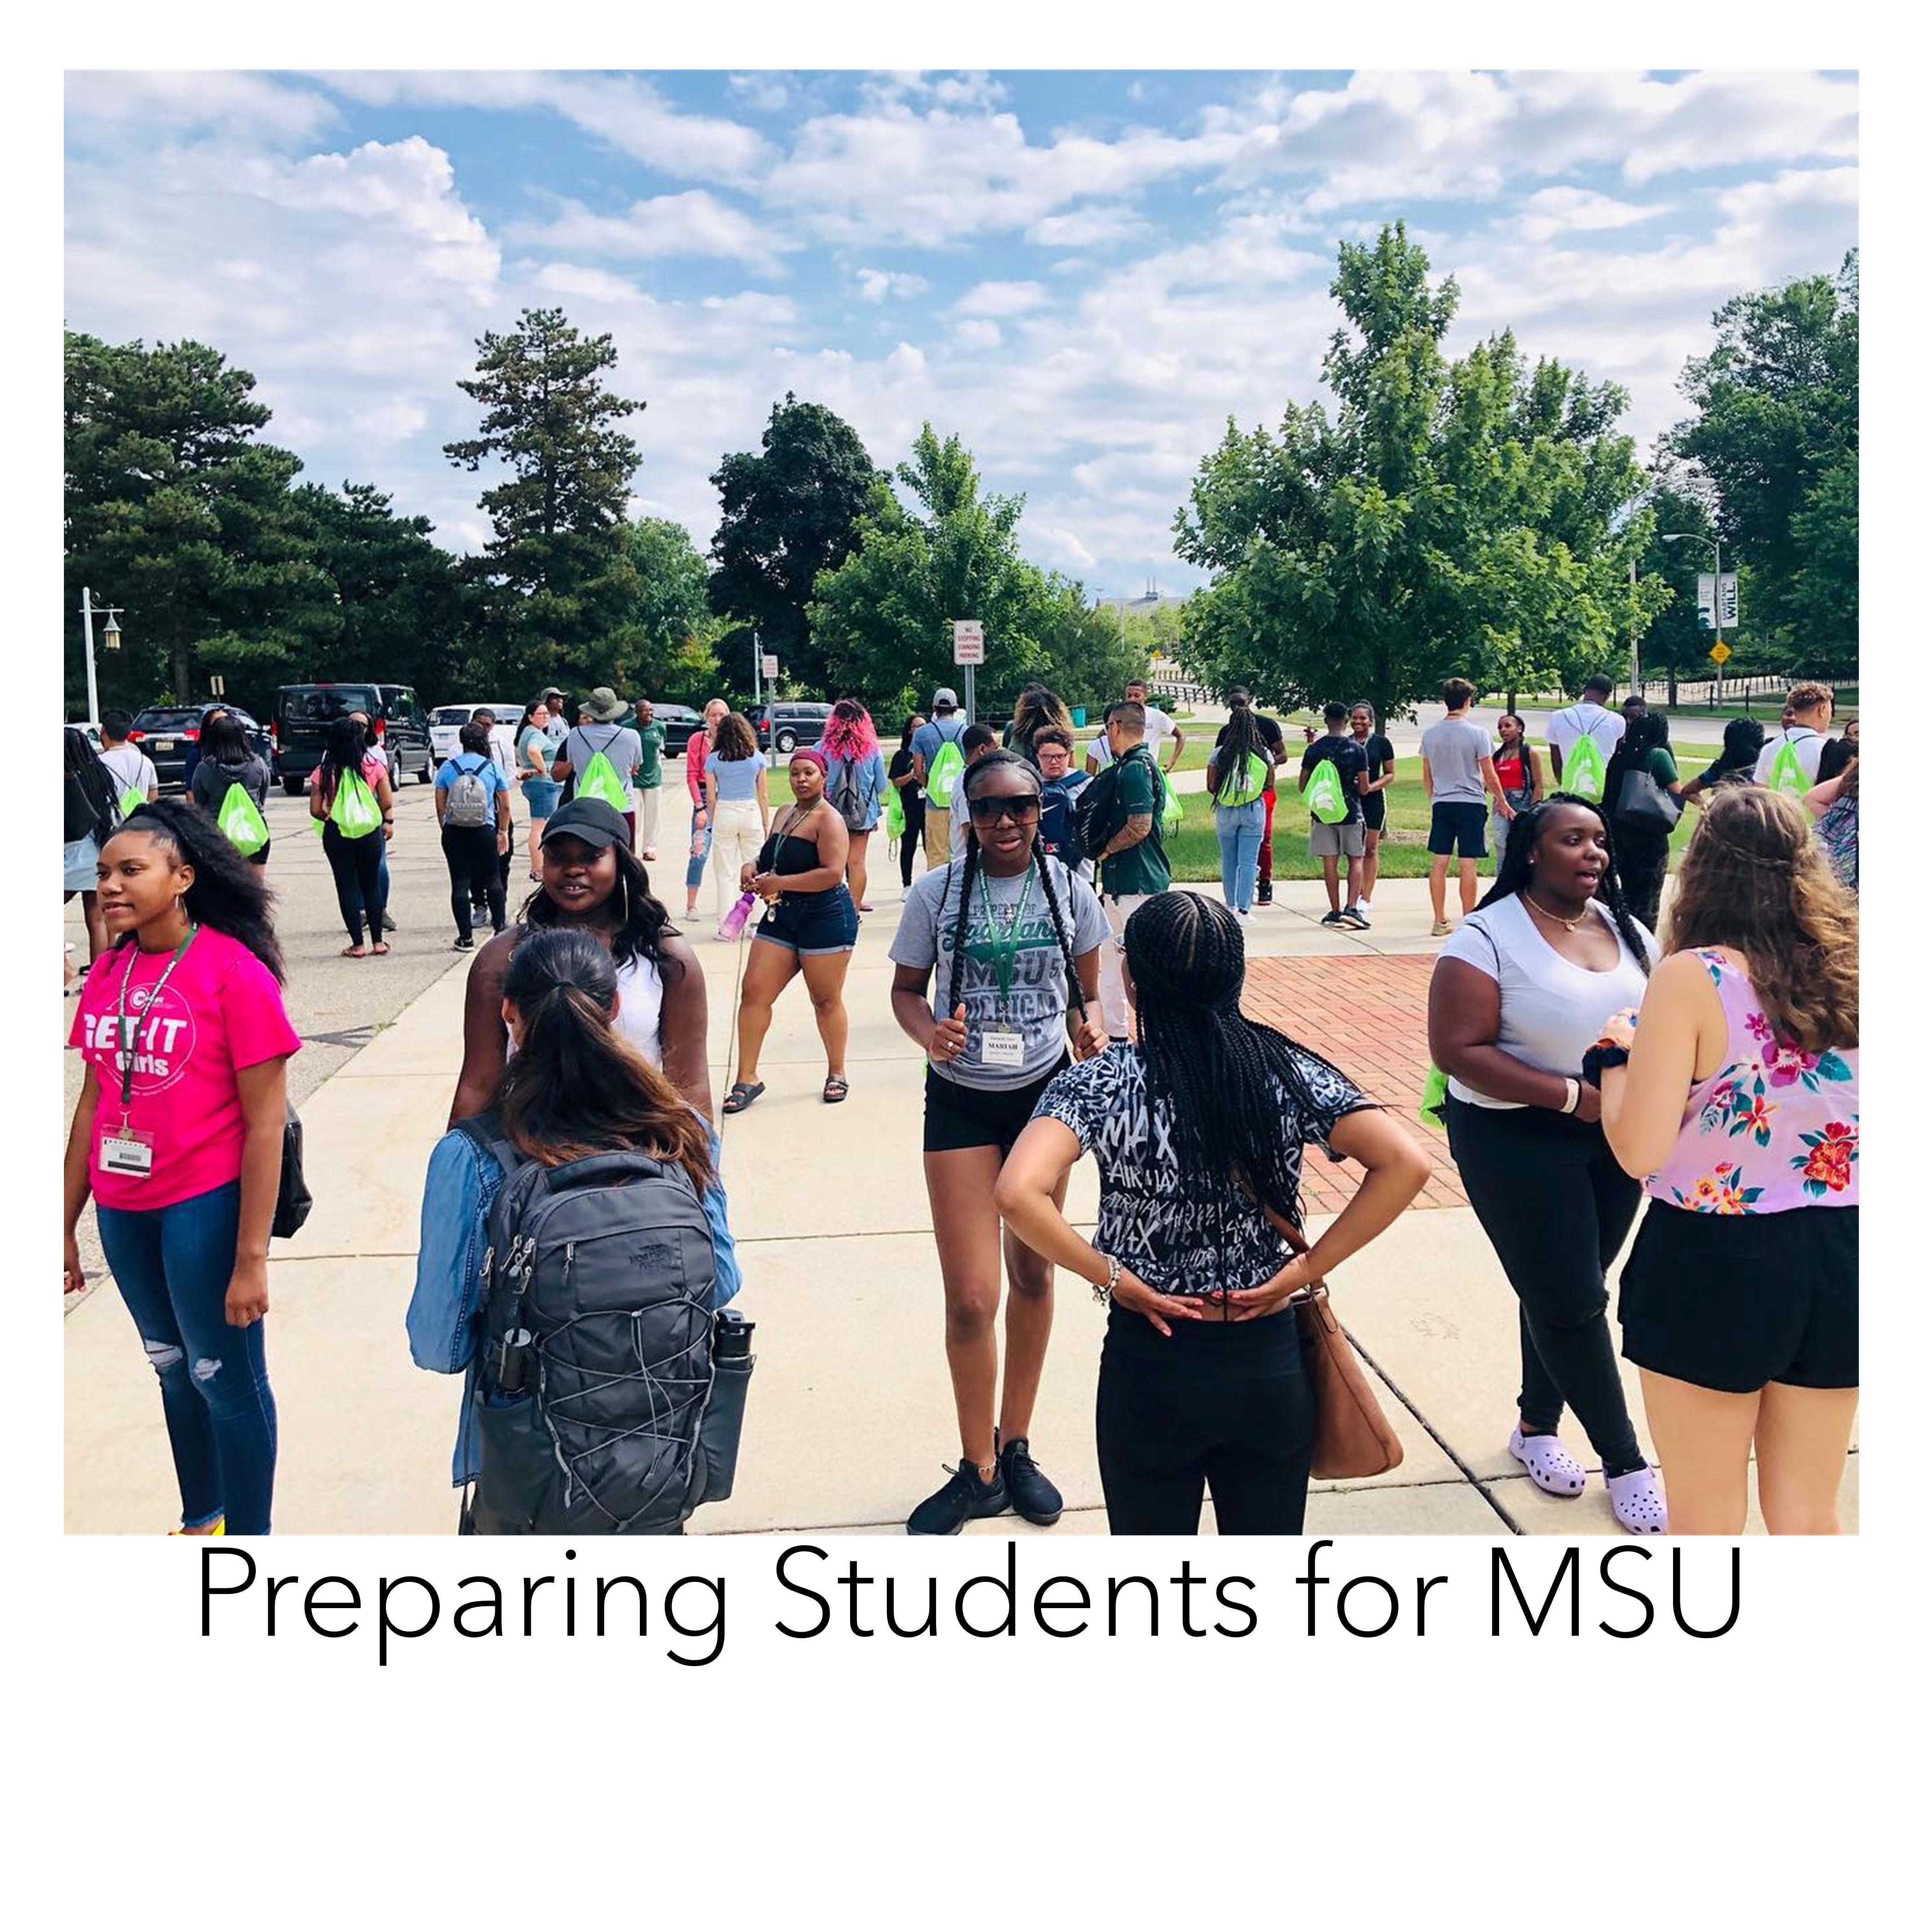 http://ocat.msu.edu/wp-content/uploads/2020/07/Preparing-Students-for-MSU.jpg